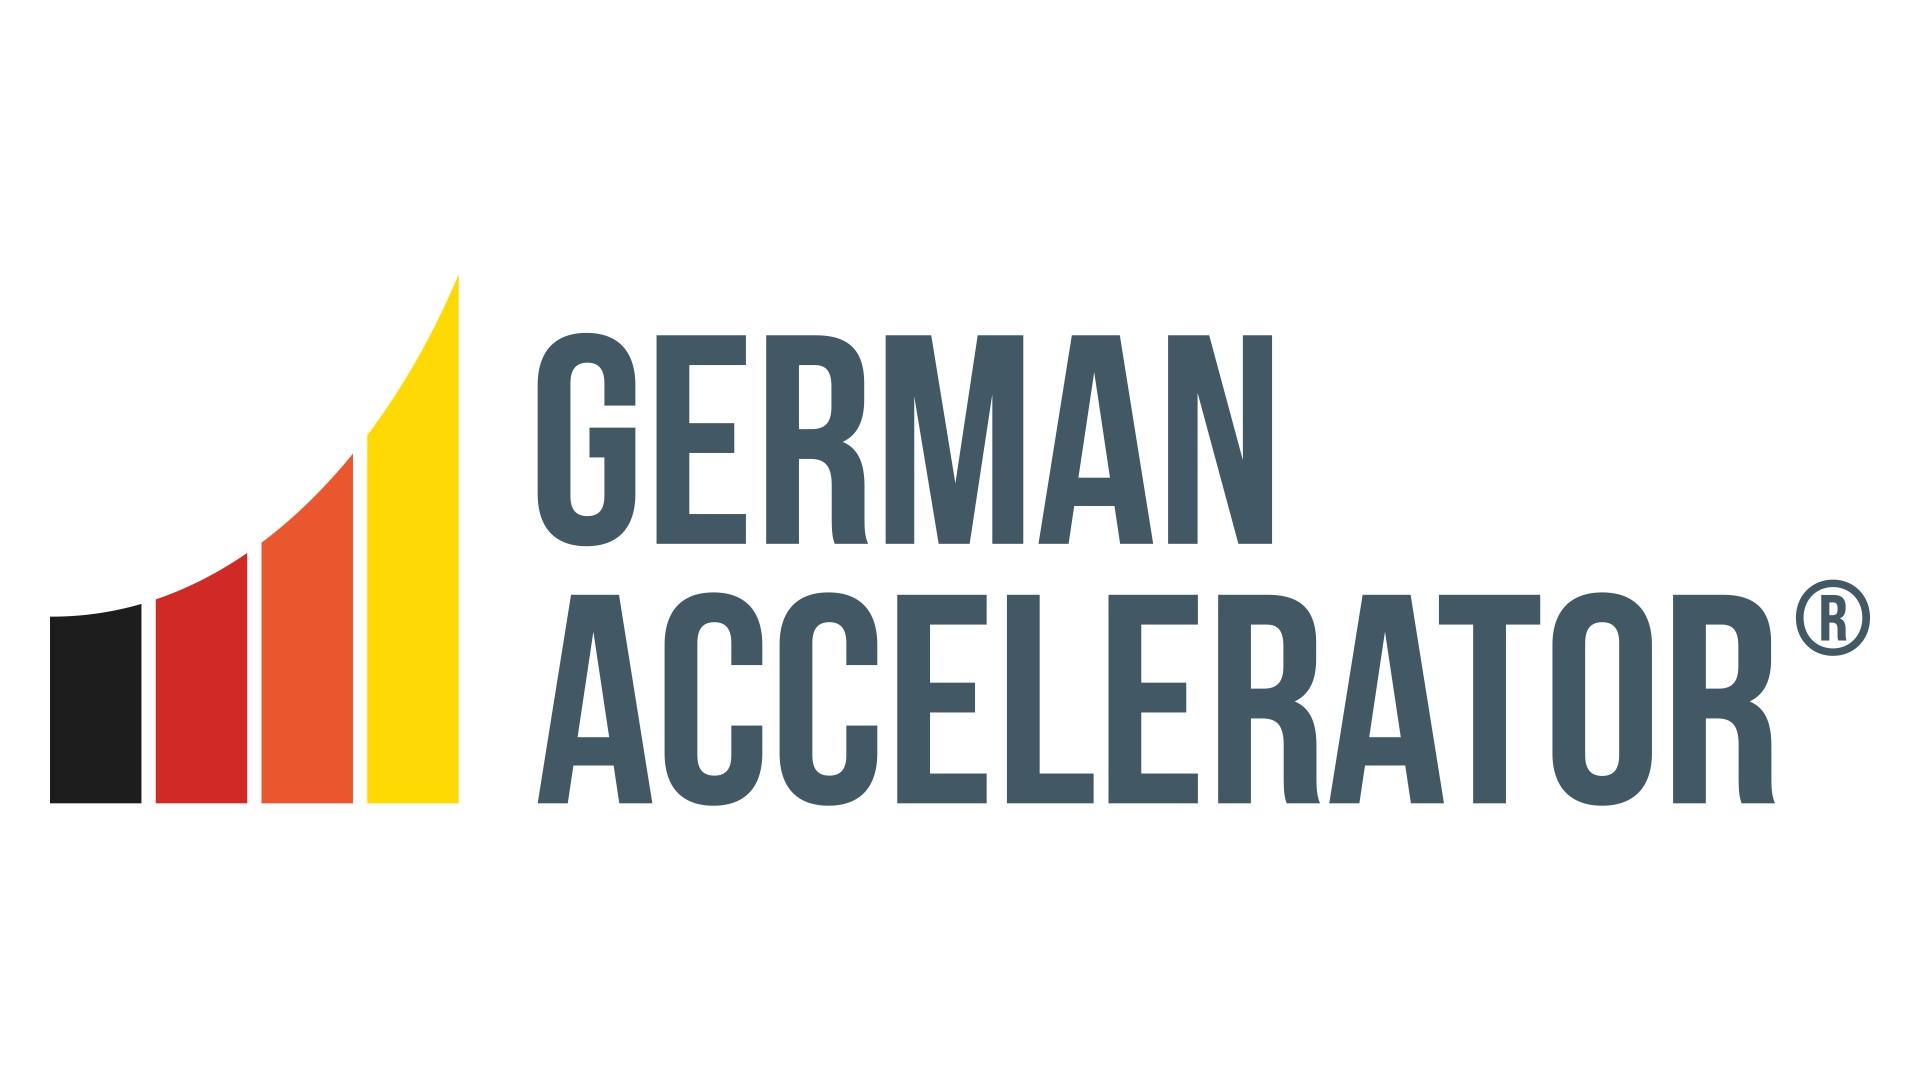 German Accelerator